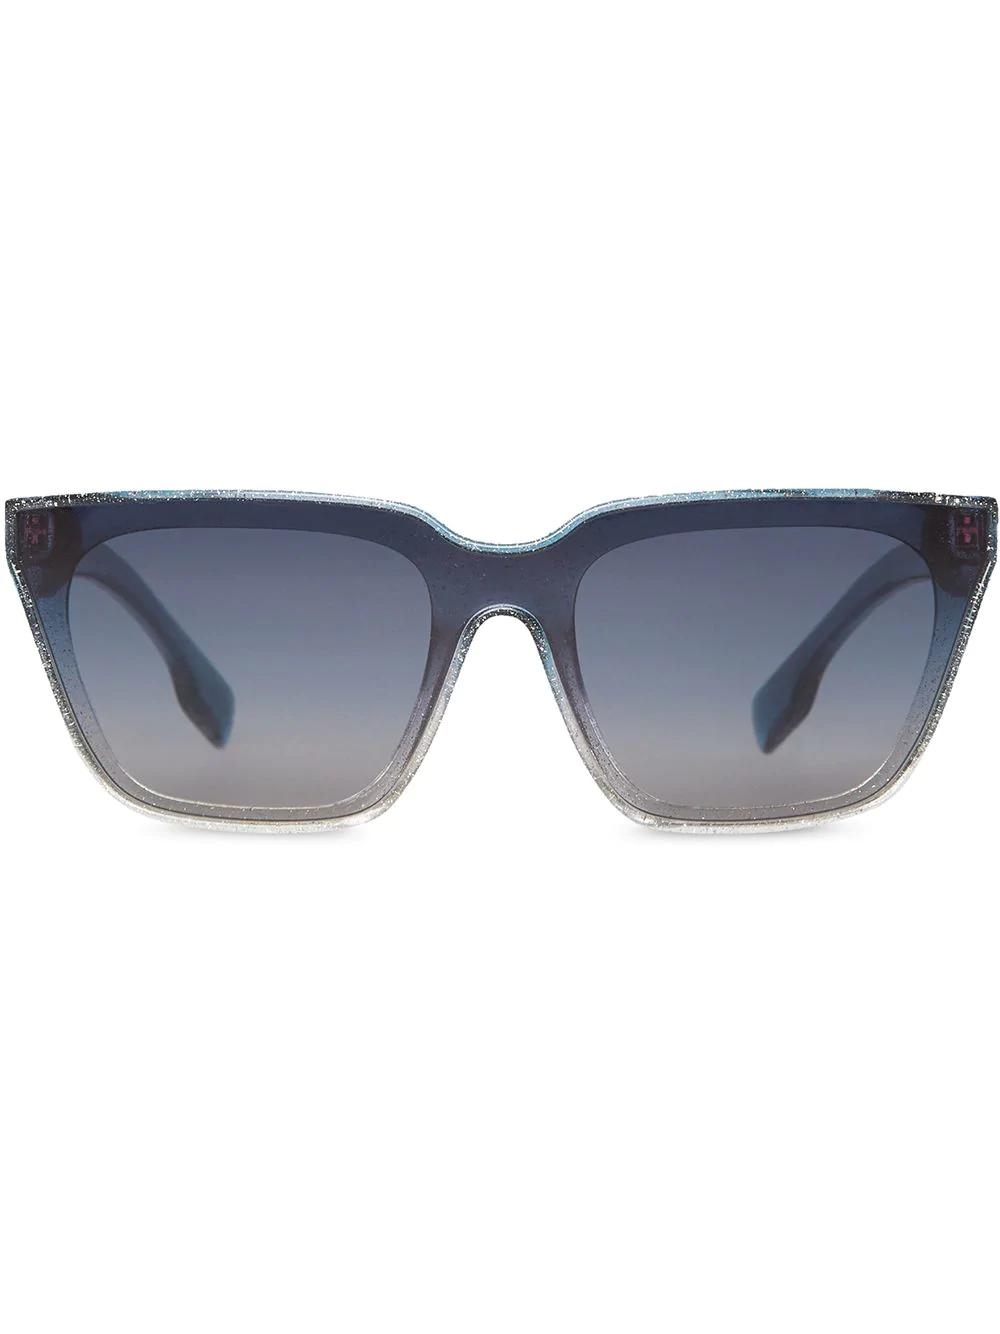 37159ac6ff Burberry Eyewear Glitter Detail Square Frame Shield Sunglasses - Blue